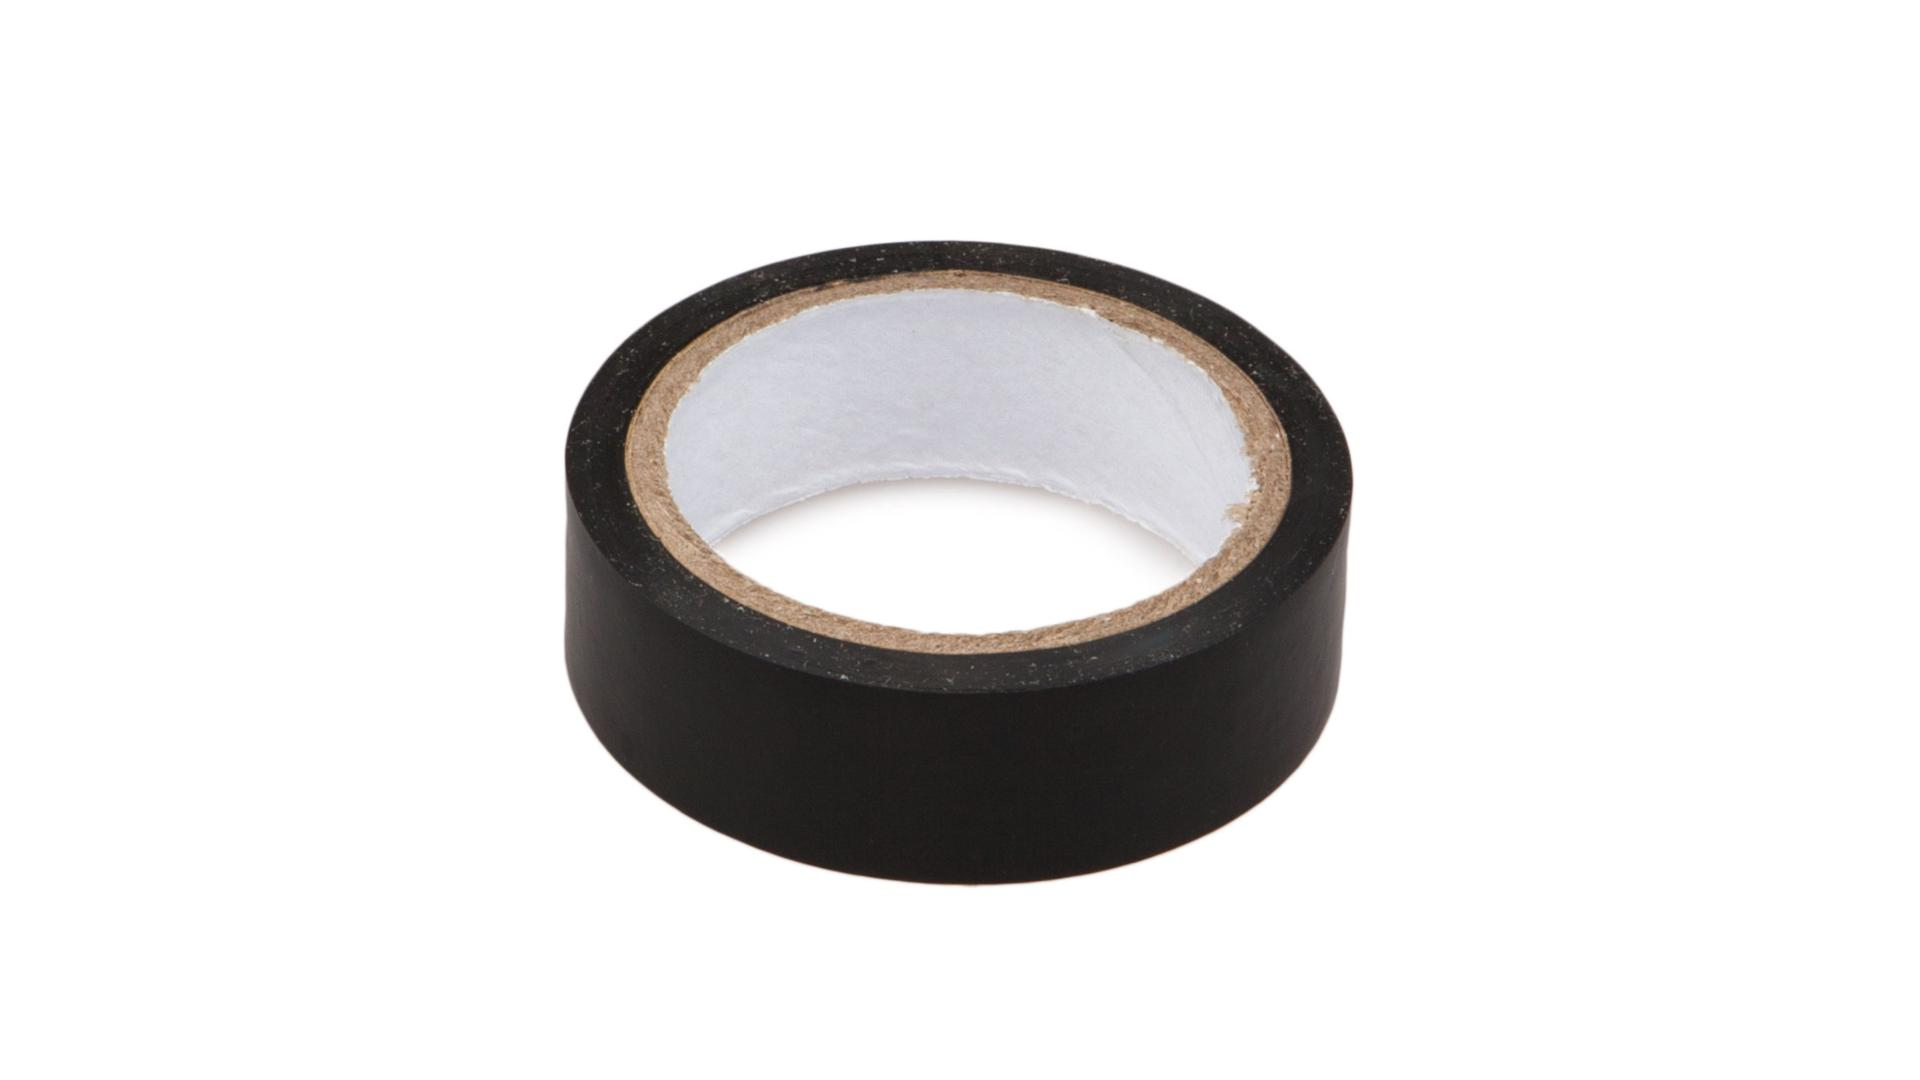 4CARS Izolační páska černá 10ks, 15mm